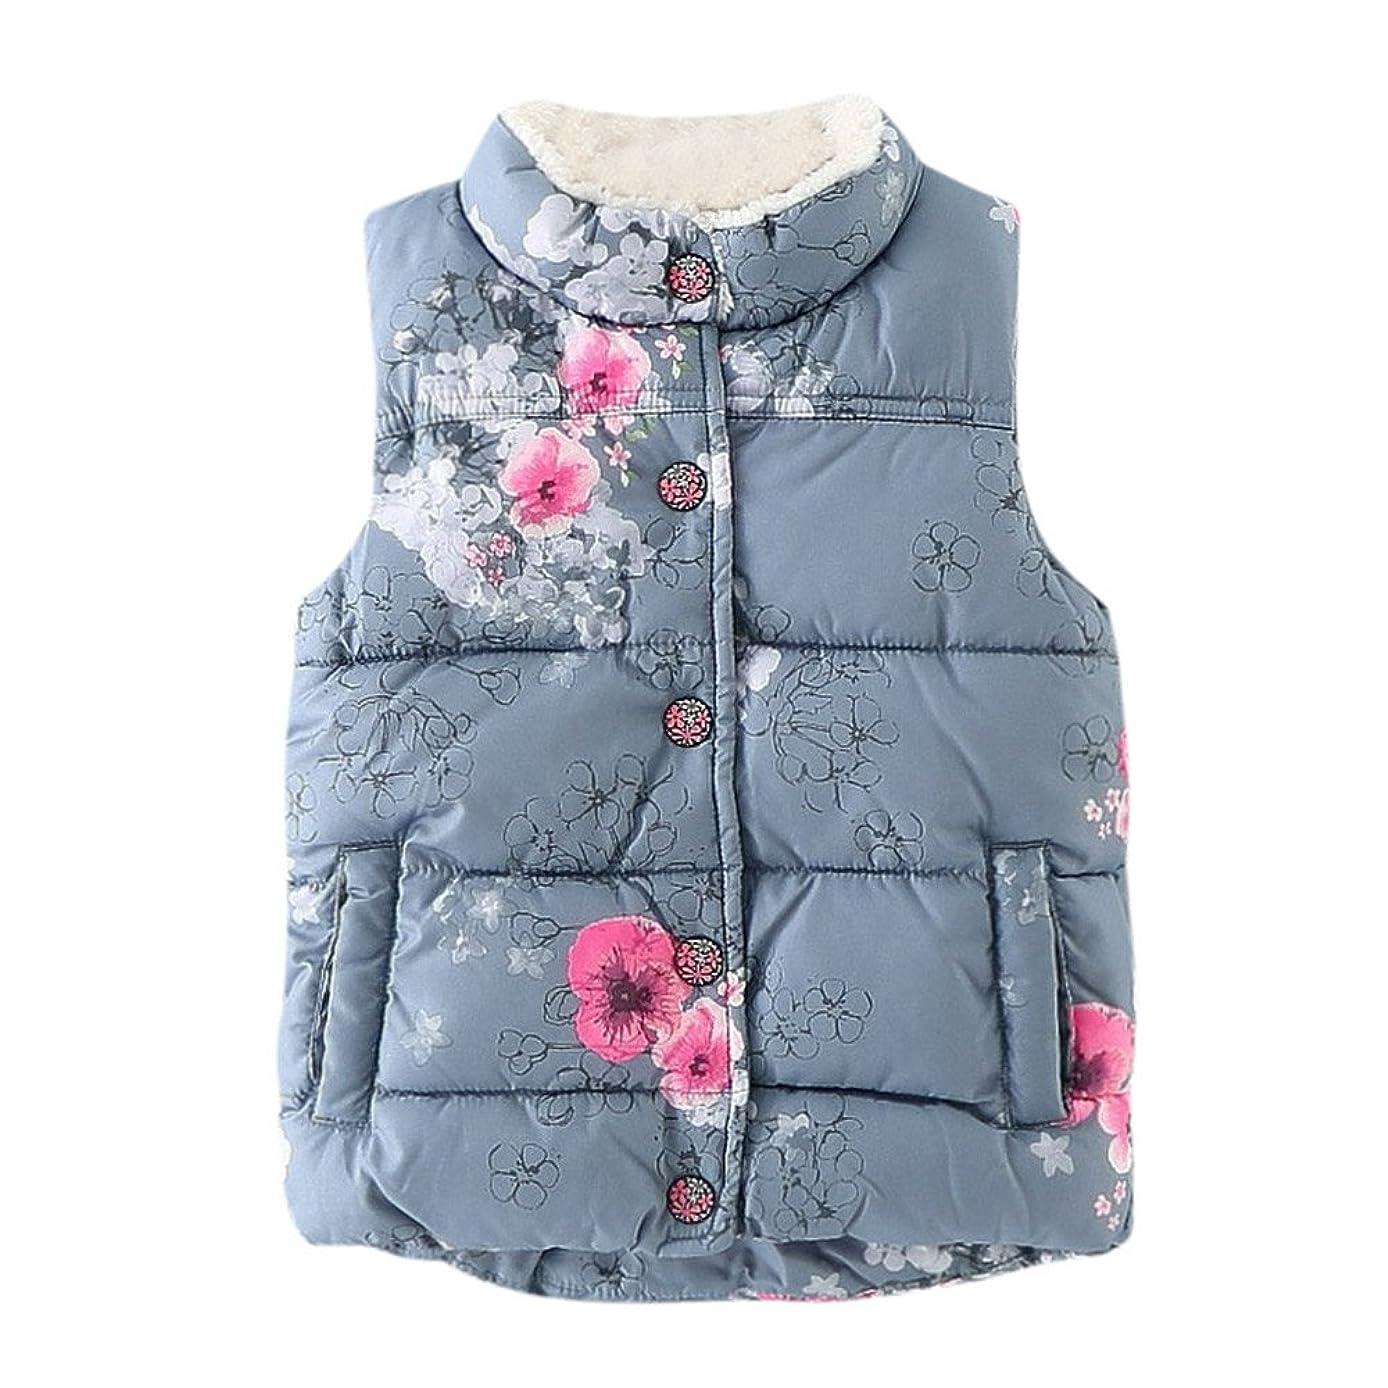 Sameno Baby Boys Girls Kid Infant Toddler Sleeveless Floral Vests Jackets Warm Waistcoat Clothes Coat